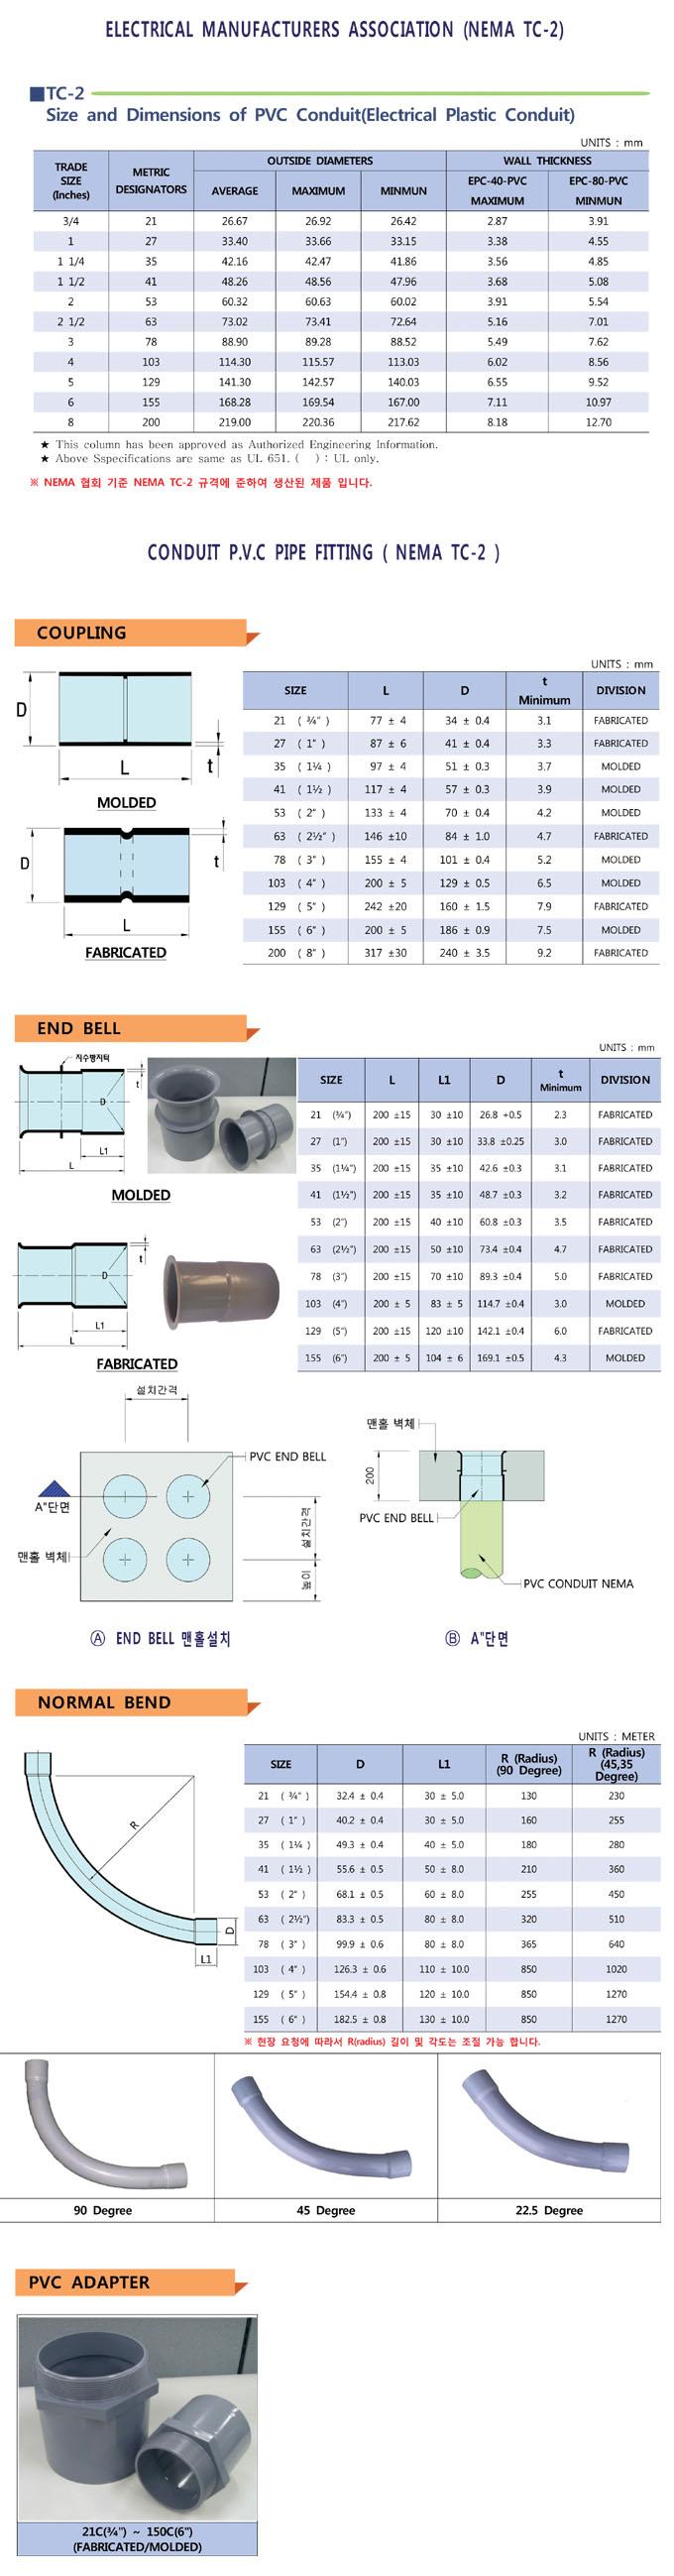 2) NEMA TC-2.jpg